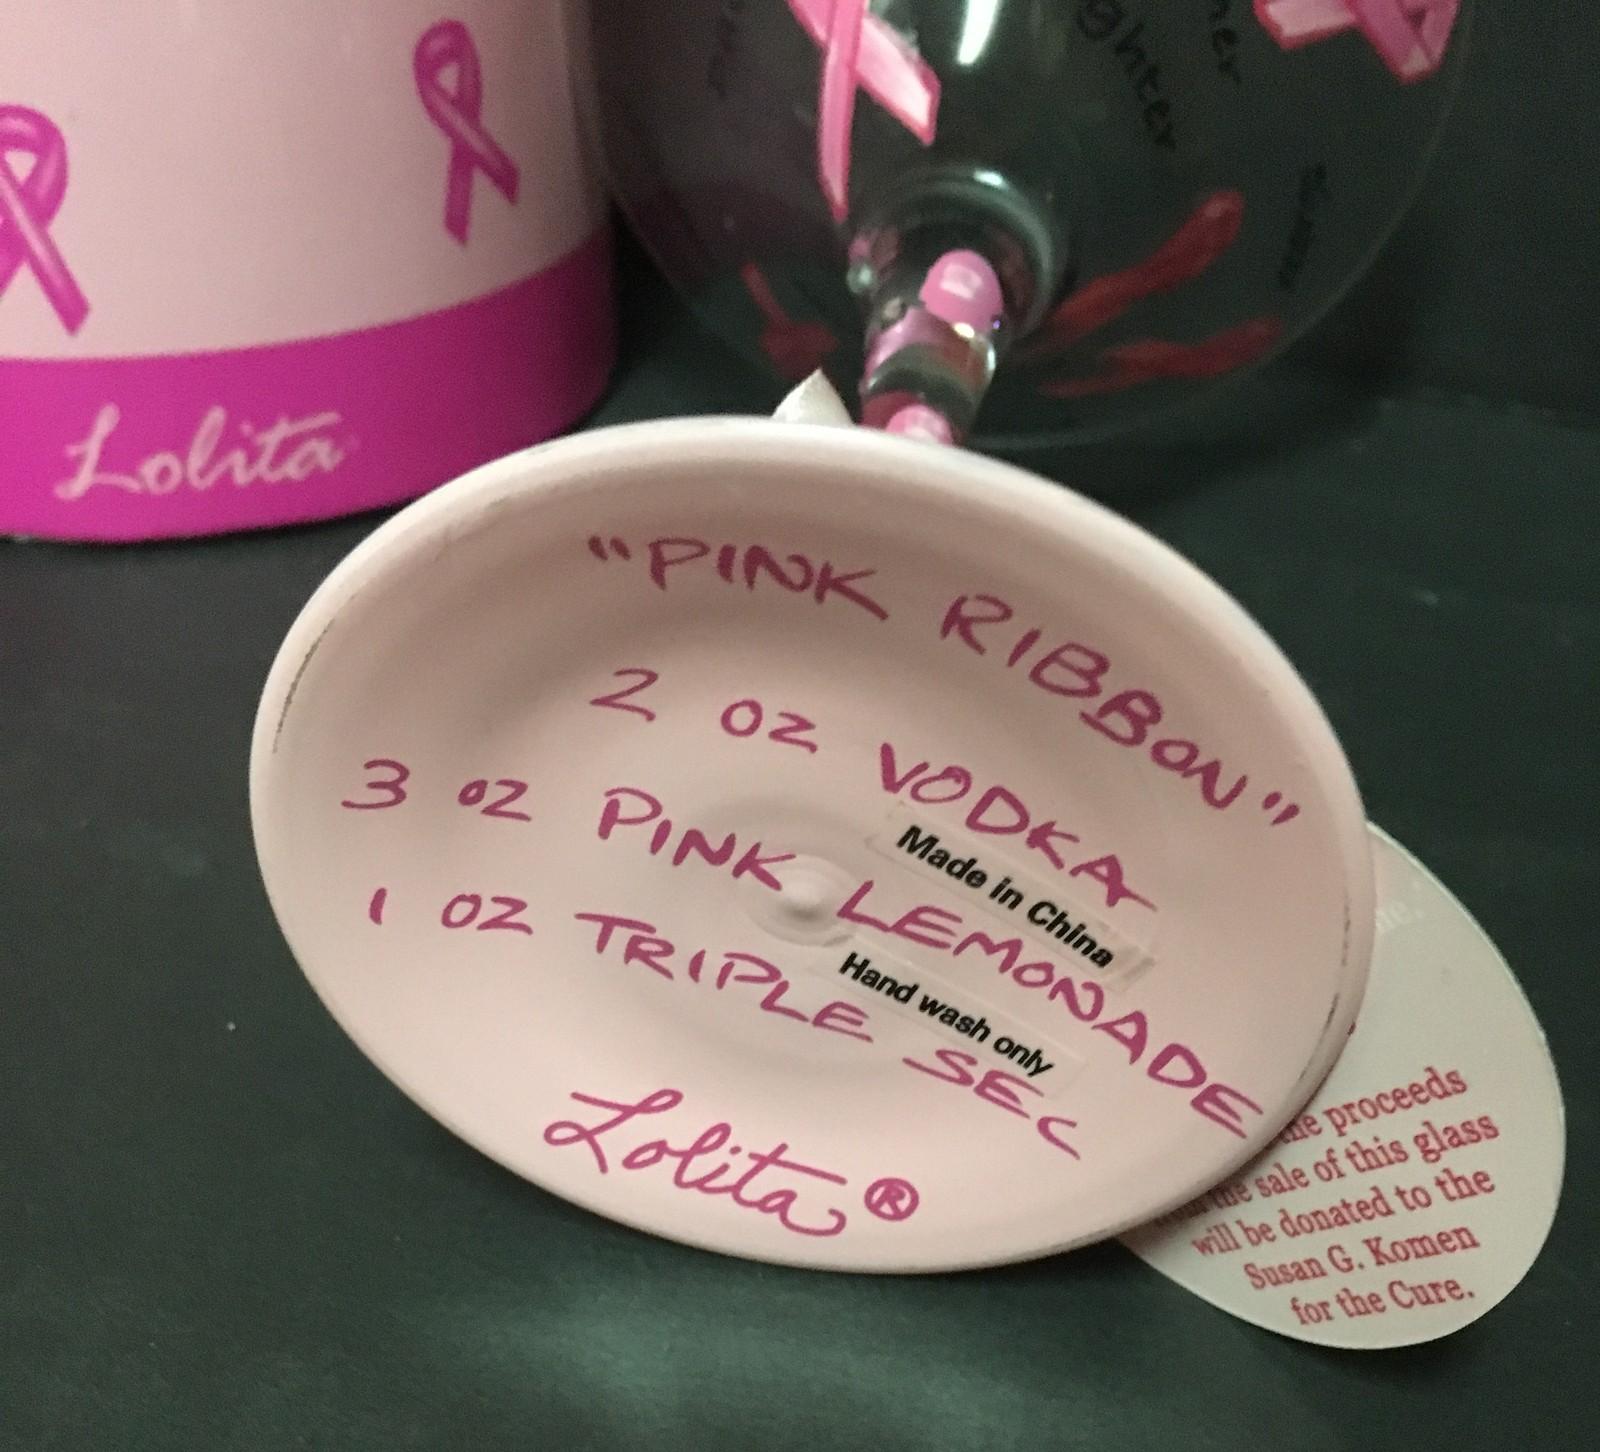 Lolita Love My Martini Glass Cancer Awareness 7 Oz Recipe